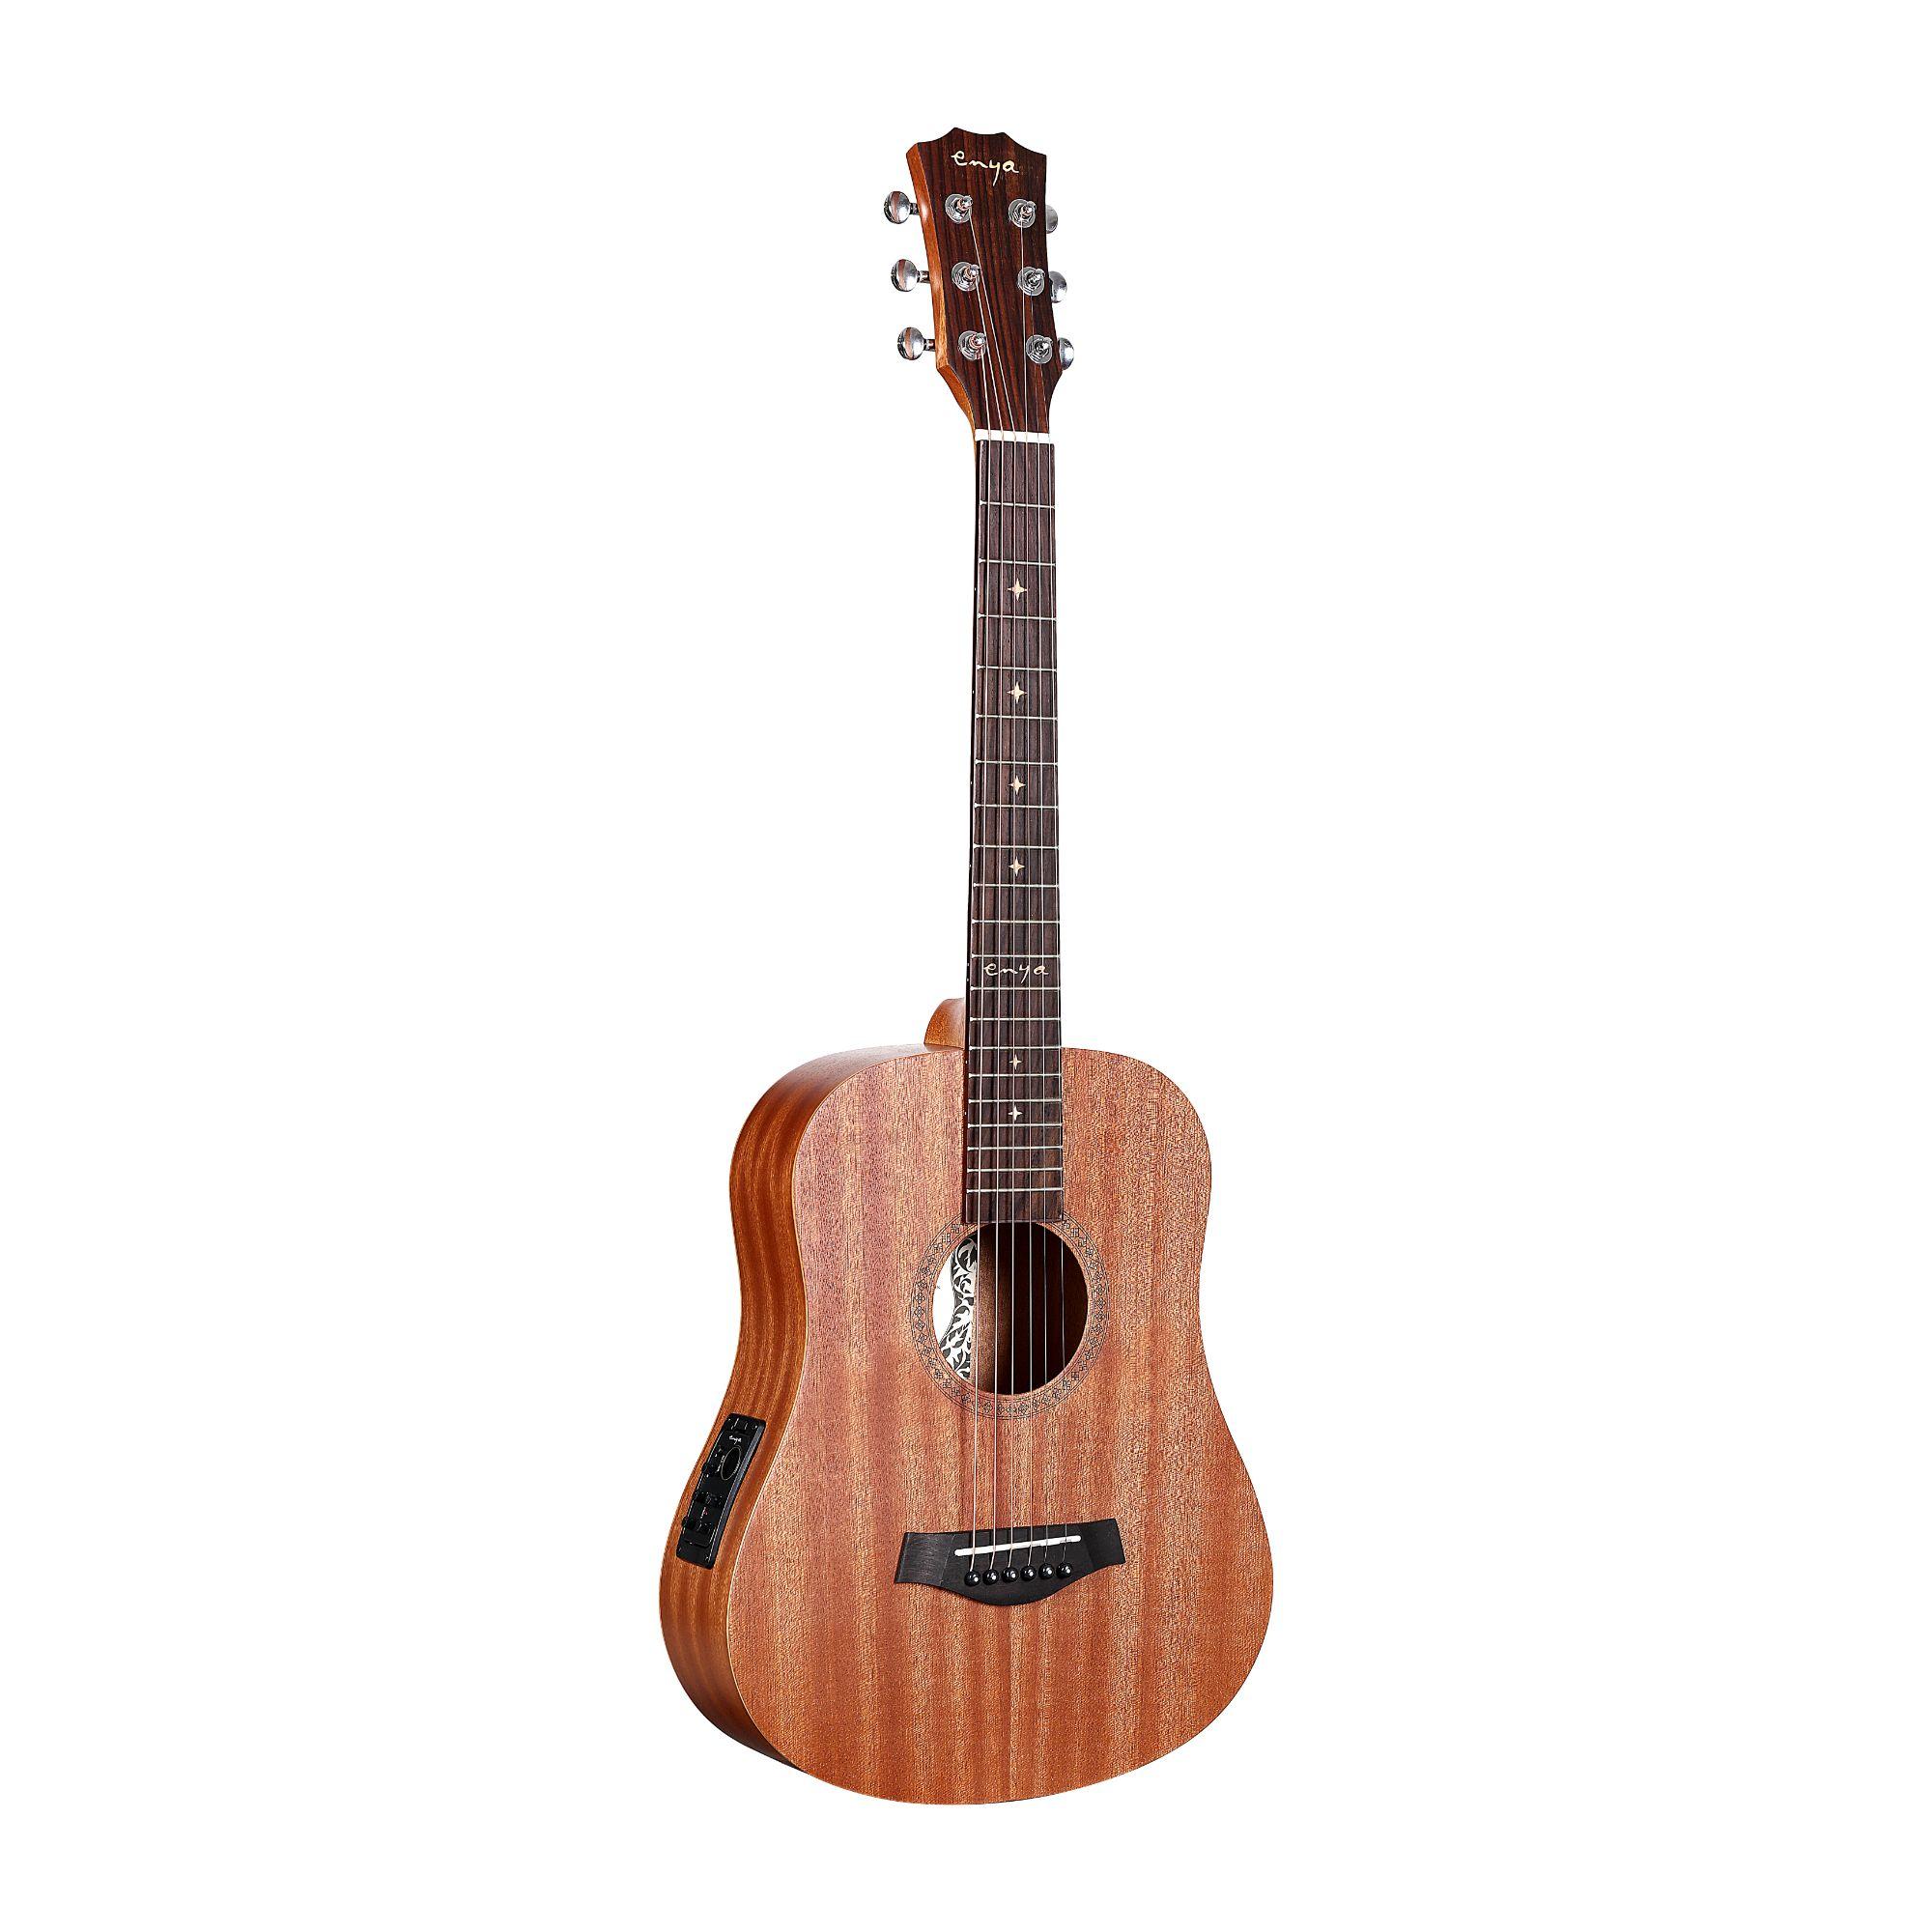 Enya EB-01 EQ Mini Travel Guitar- Natural Matt